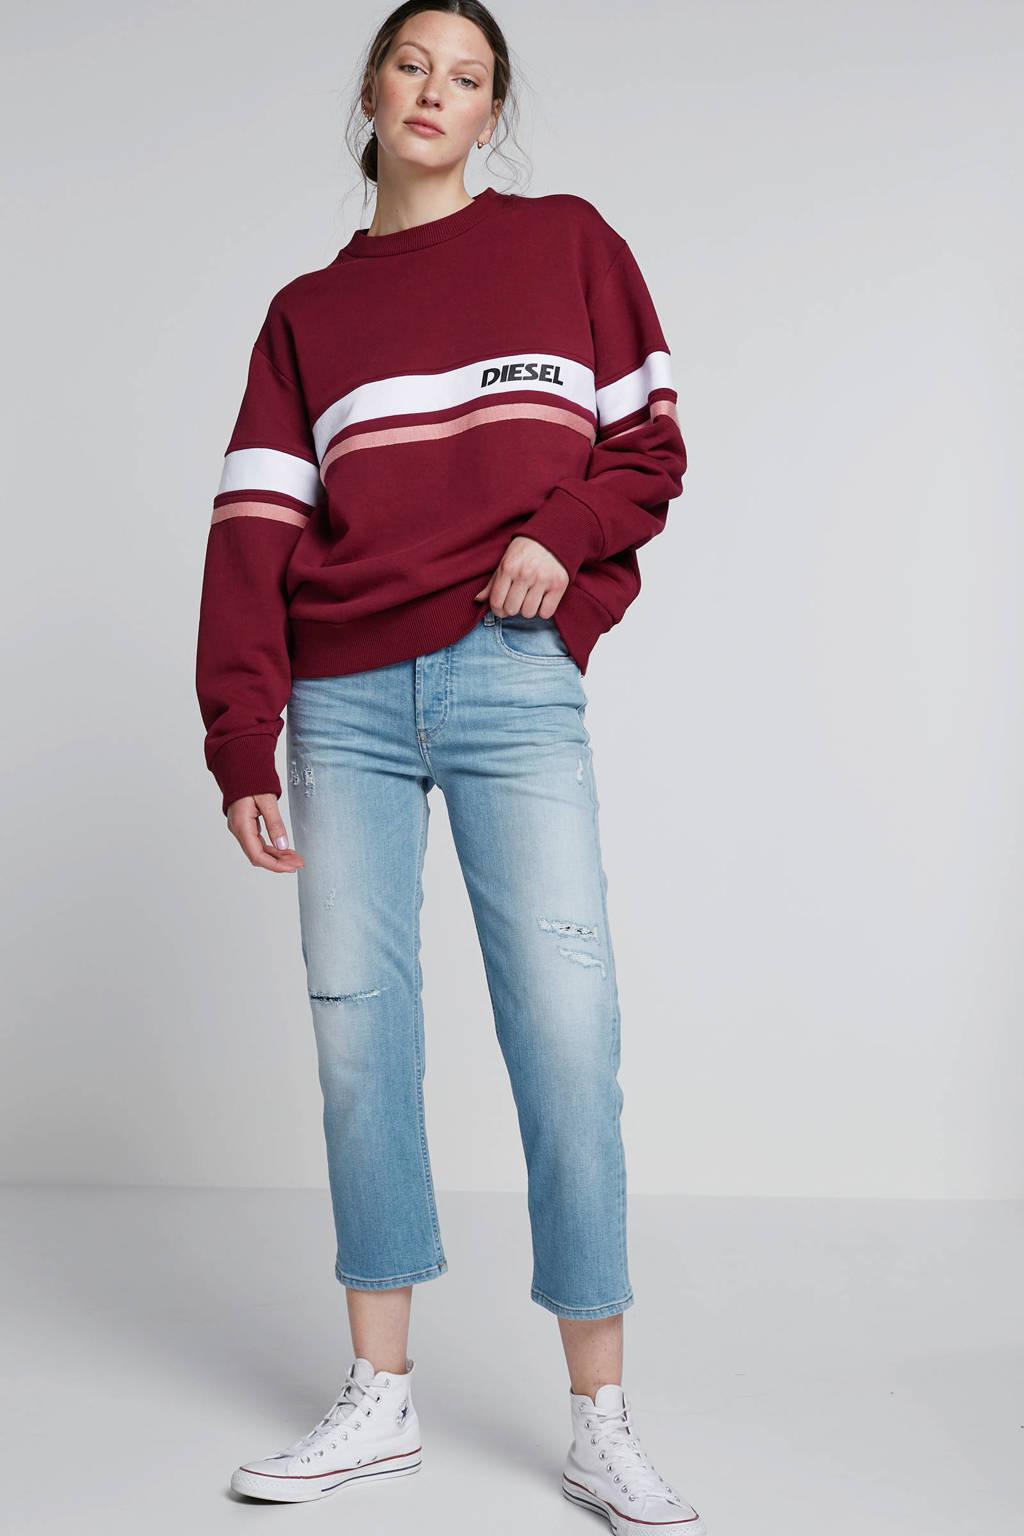 Diesel flared jeans Aryel, Light denim